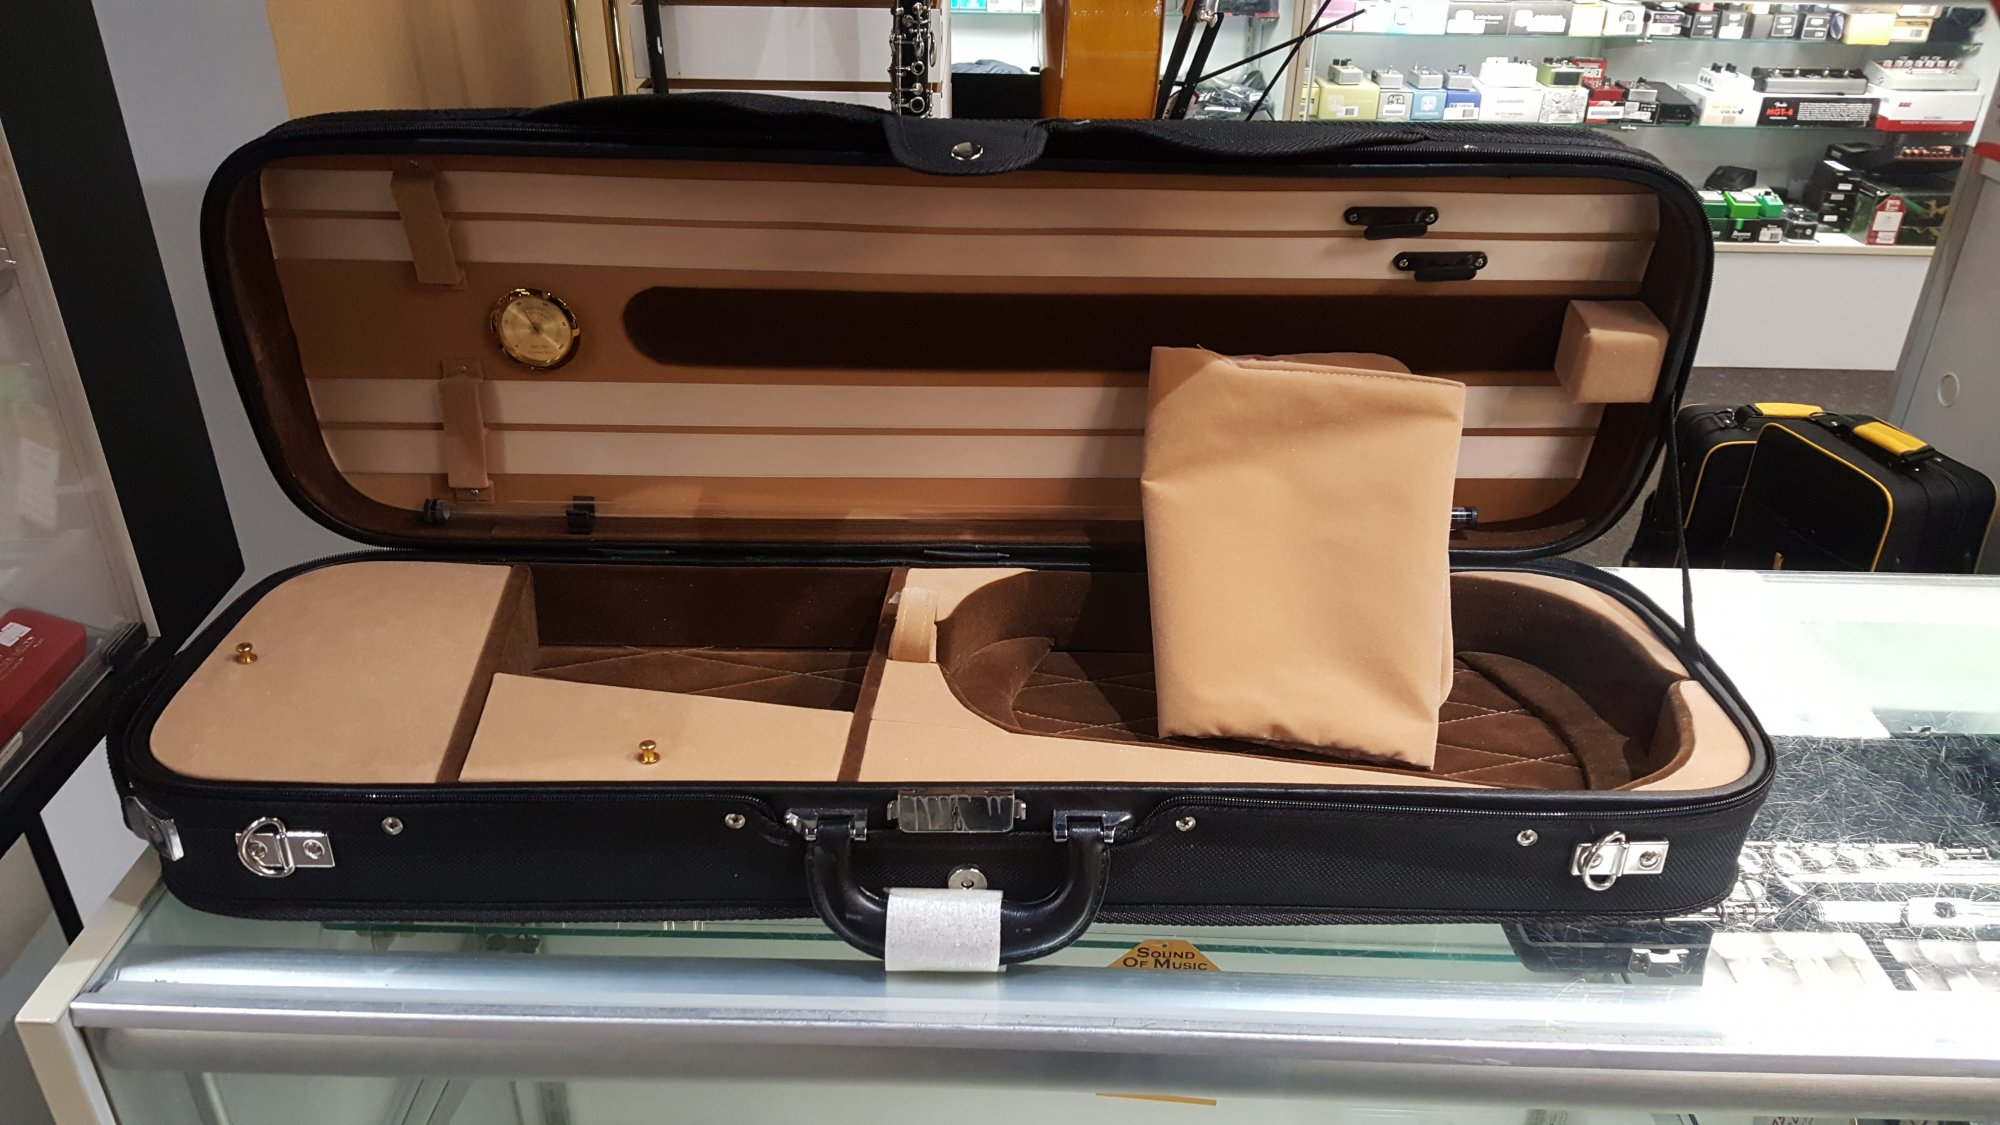 Sound of Music No. 5500 Plywood Suspension Case 4/4 Violin - Burgundy and Tan Interior